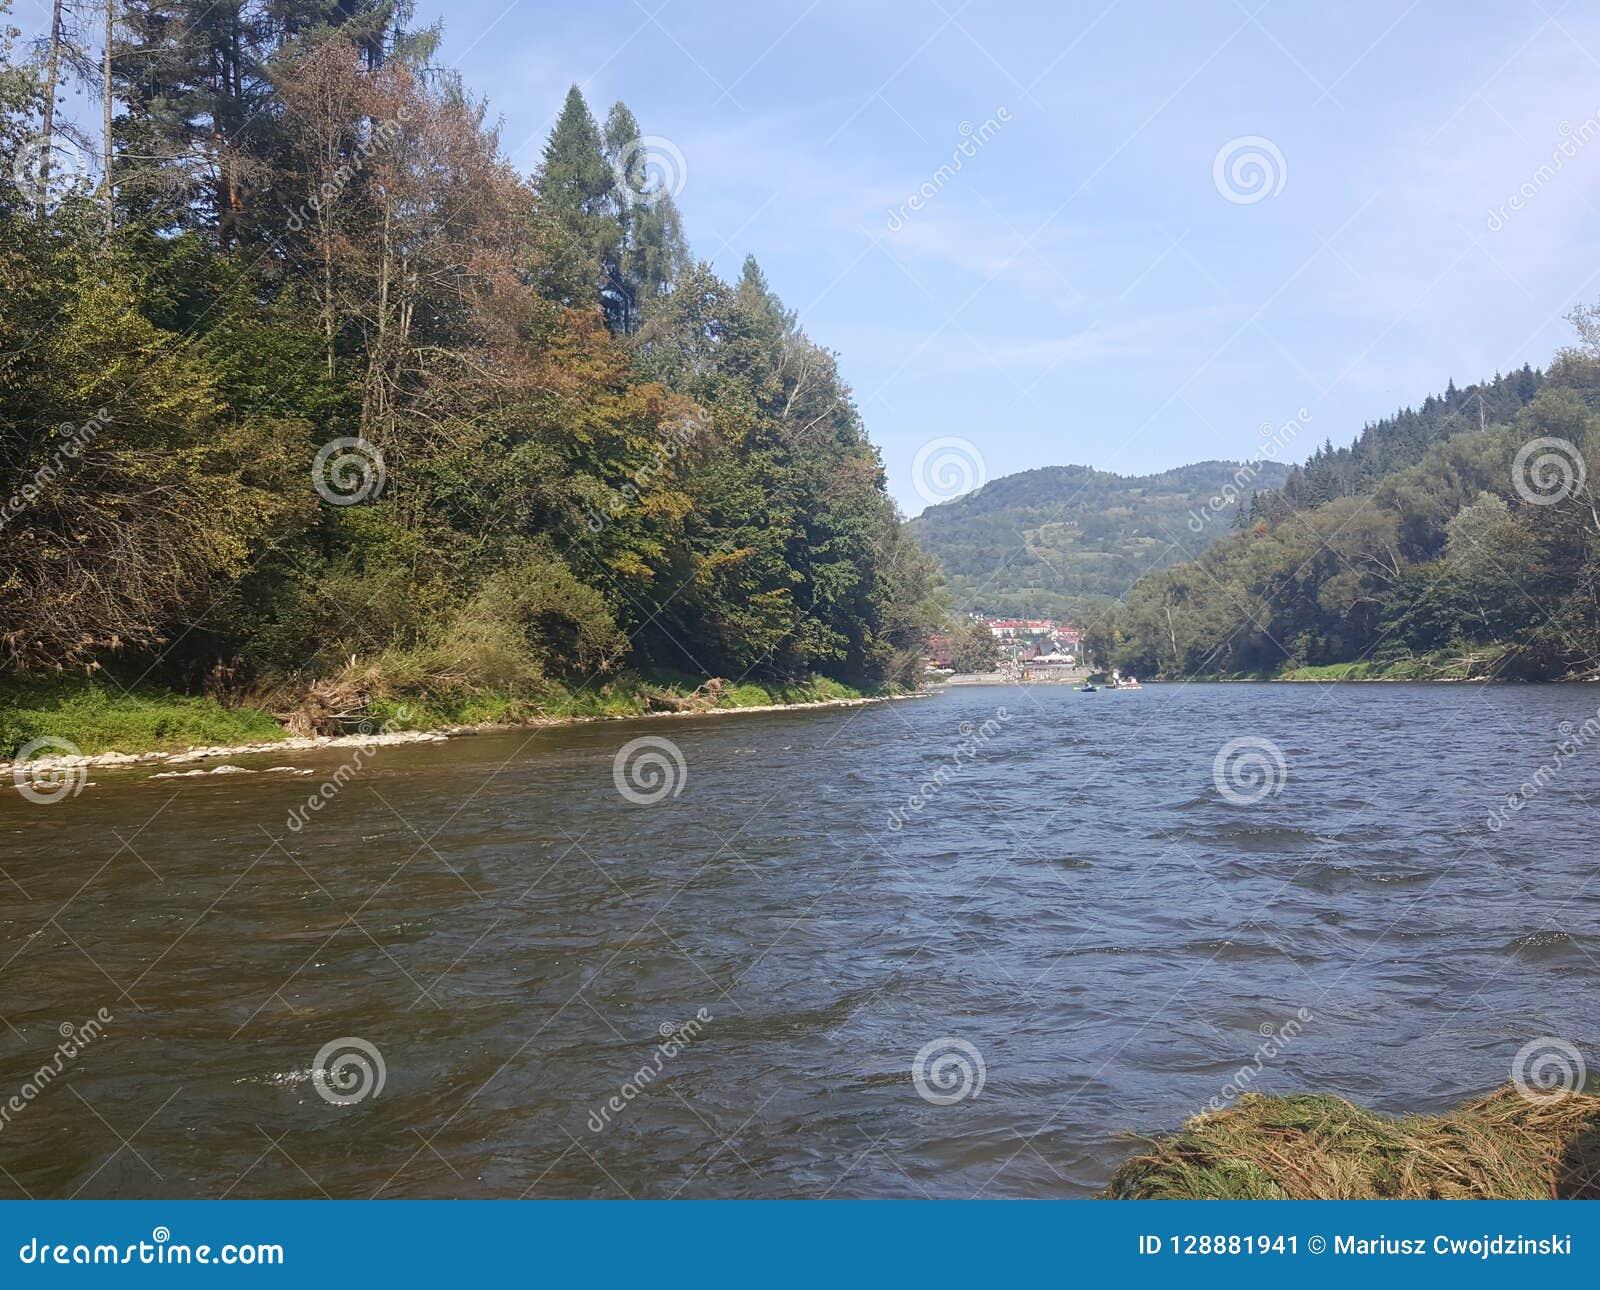 Poland, Malopolska, Pieniny - Dunajec river rafting.